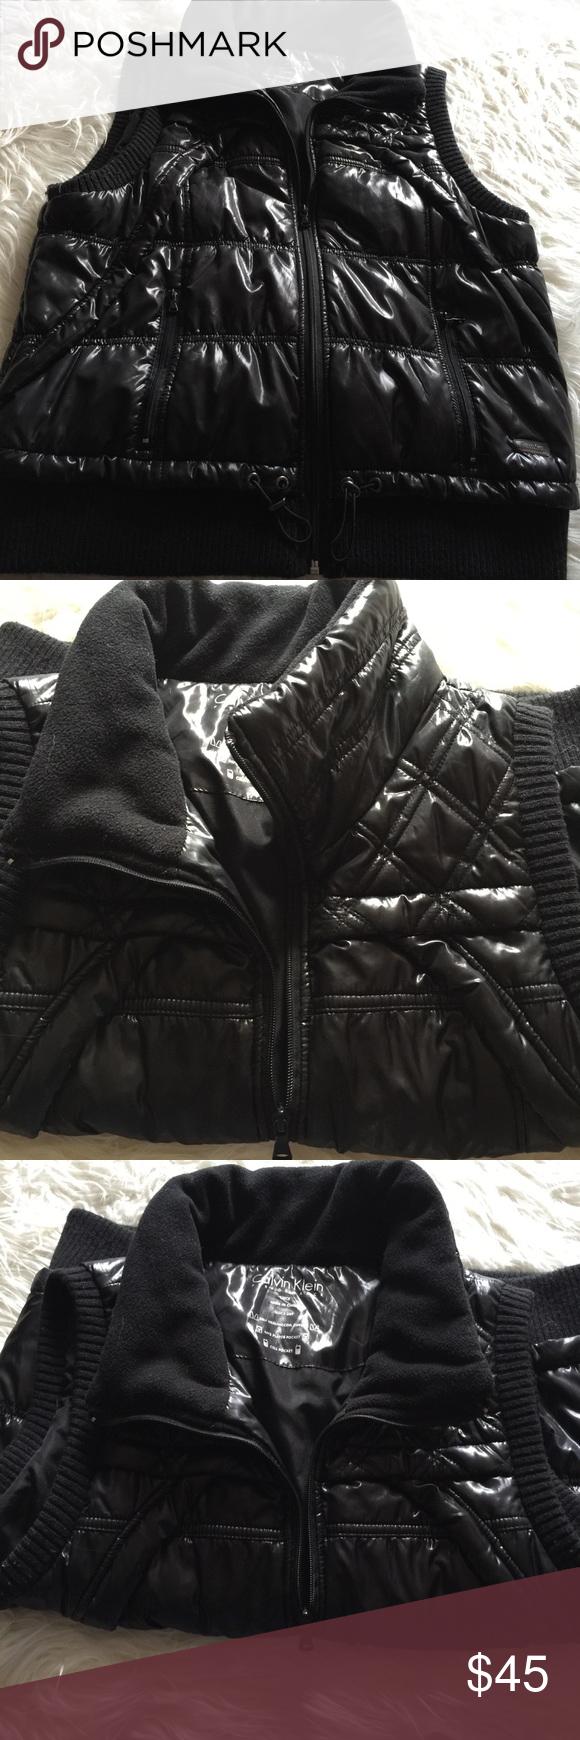 Calvin Klein sleeveless black jacket. L. Very good